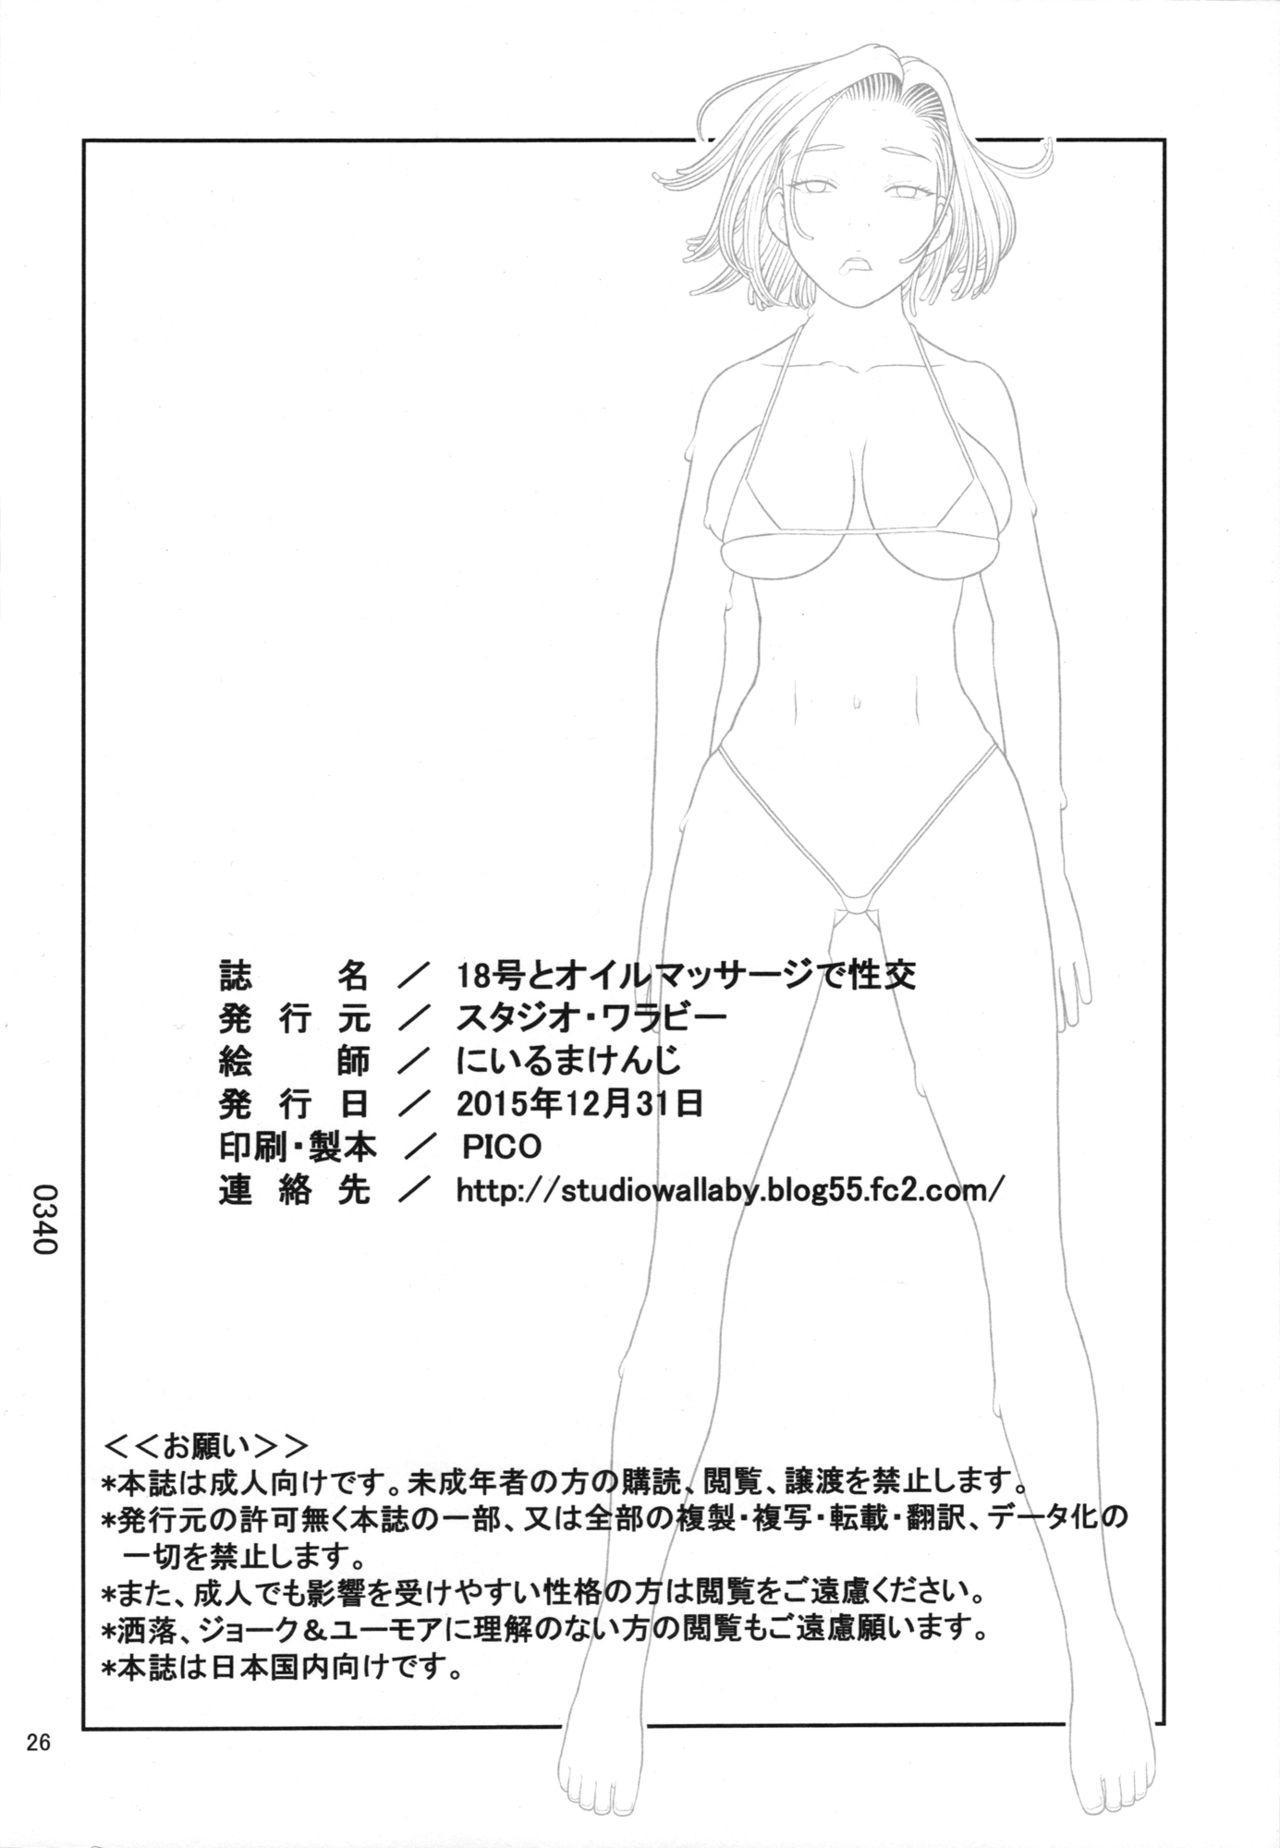 18-gou to Oil Massage de Seikou 24